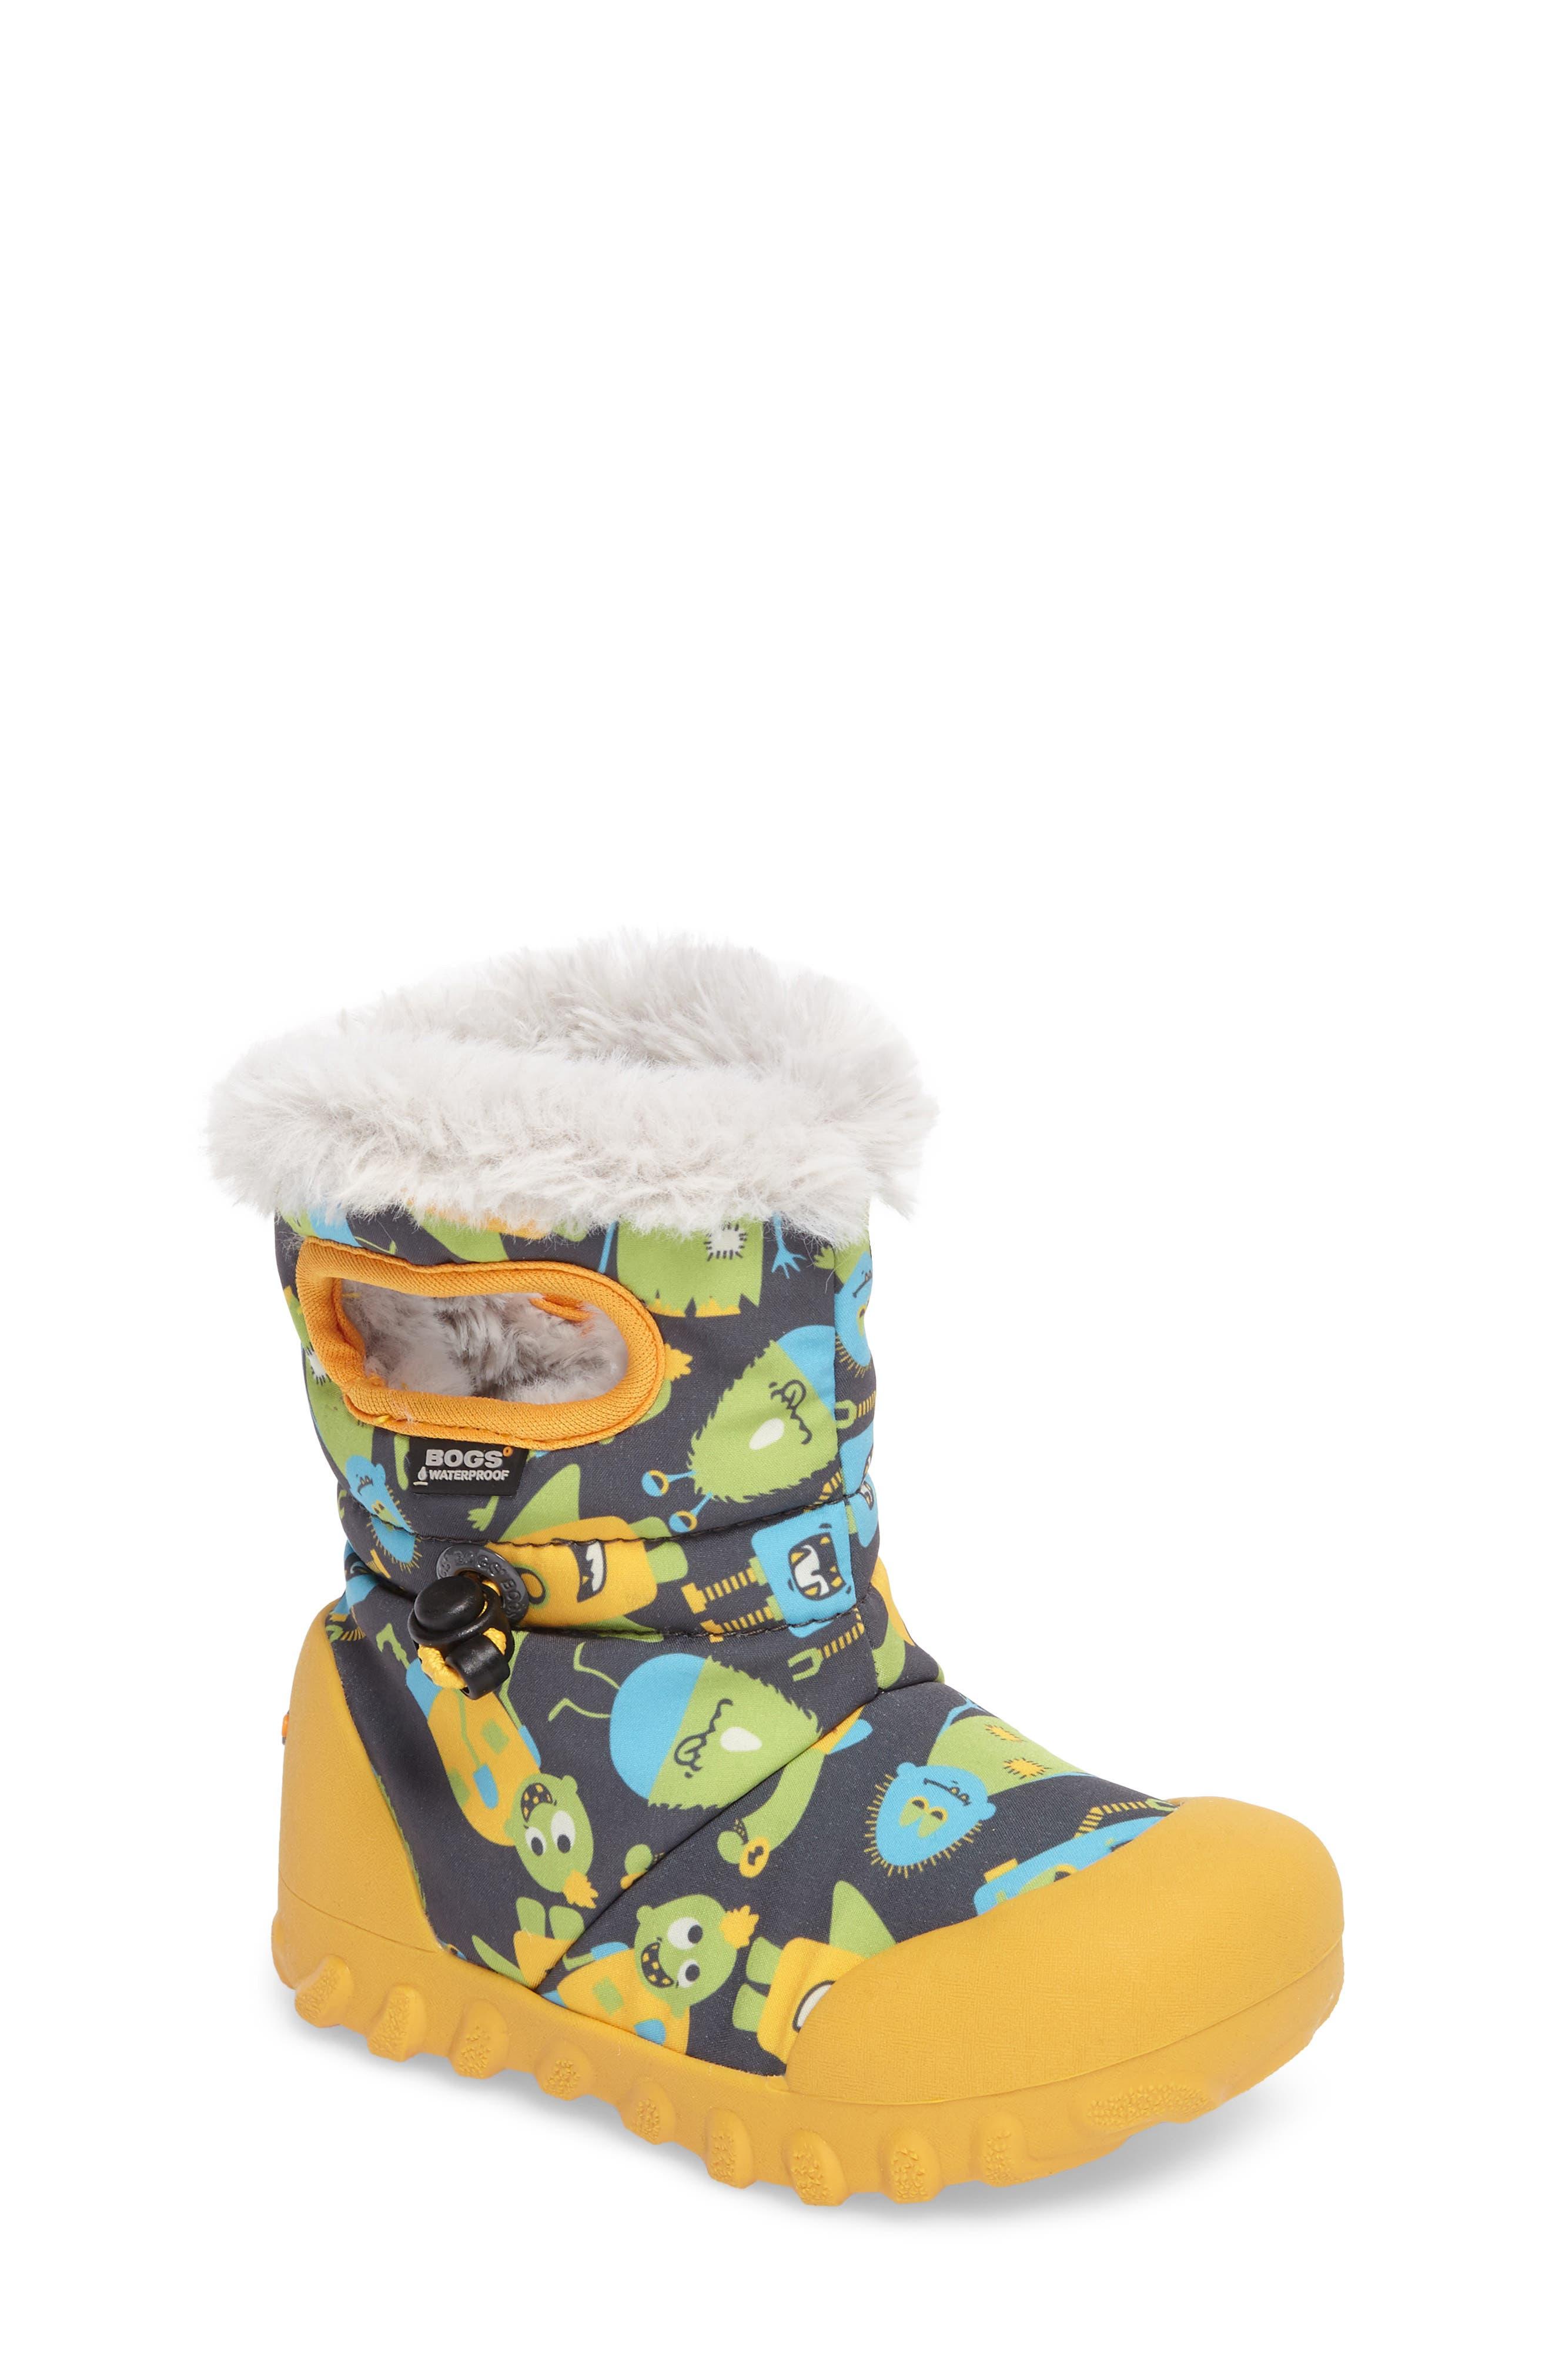 Main Image - Bogs B-MOC Monsters Waterproof Insulated Faux Fur Winter Boot (Walker, Toddler, Little Kid & Big Kid)